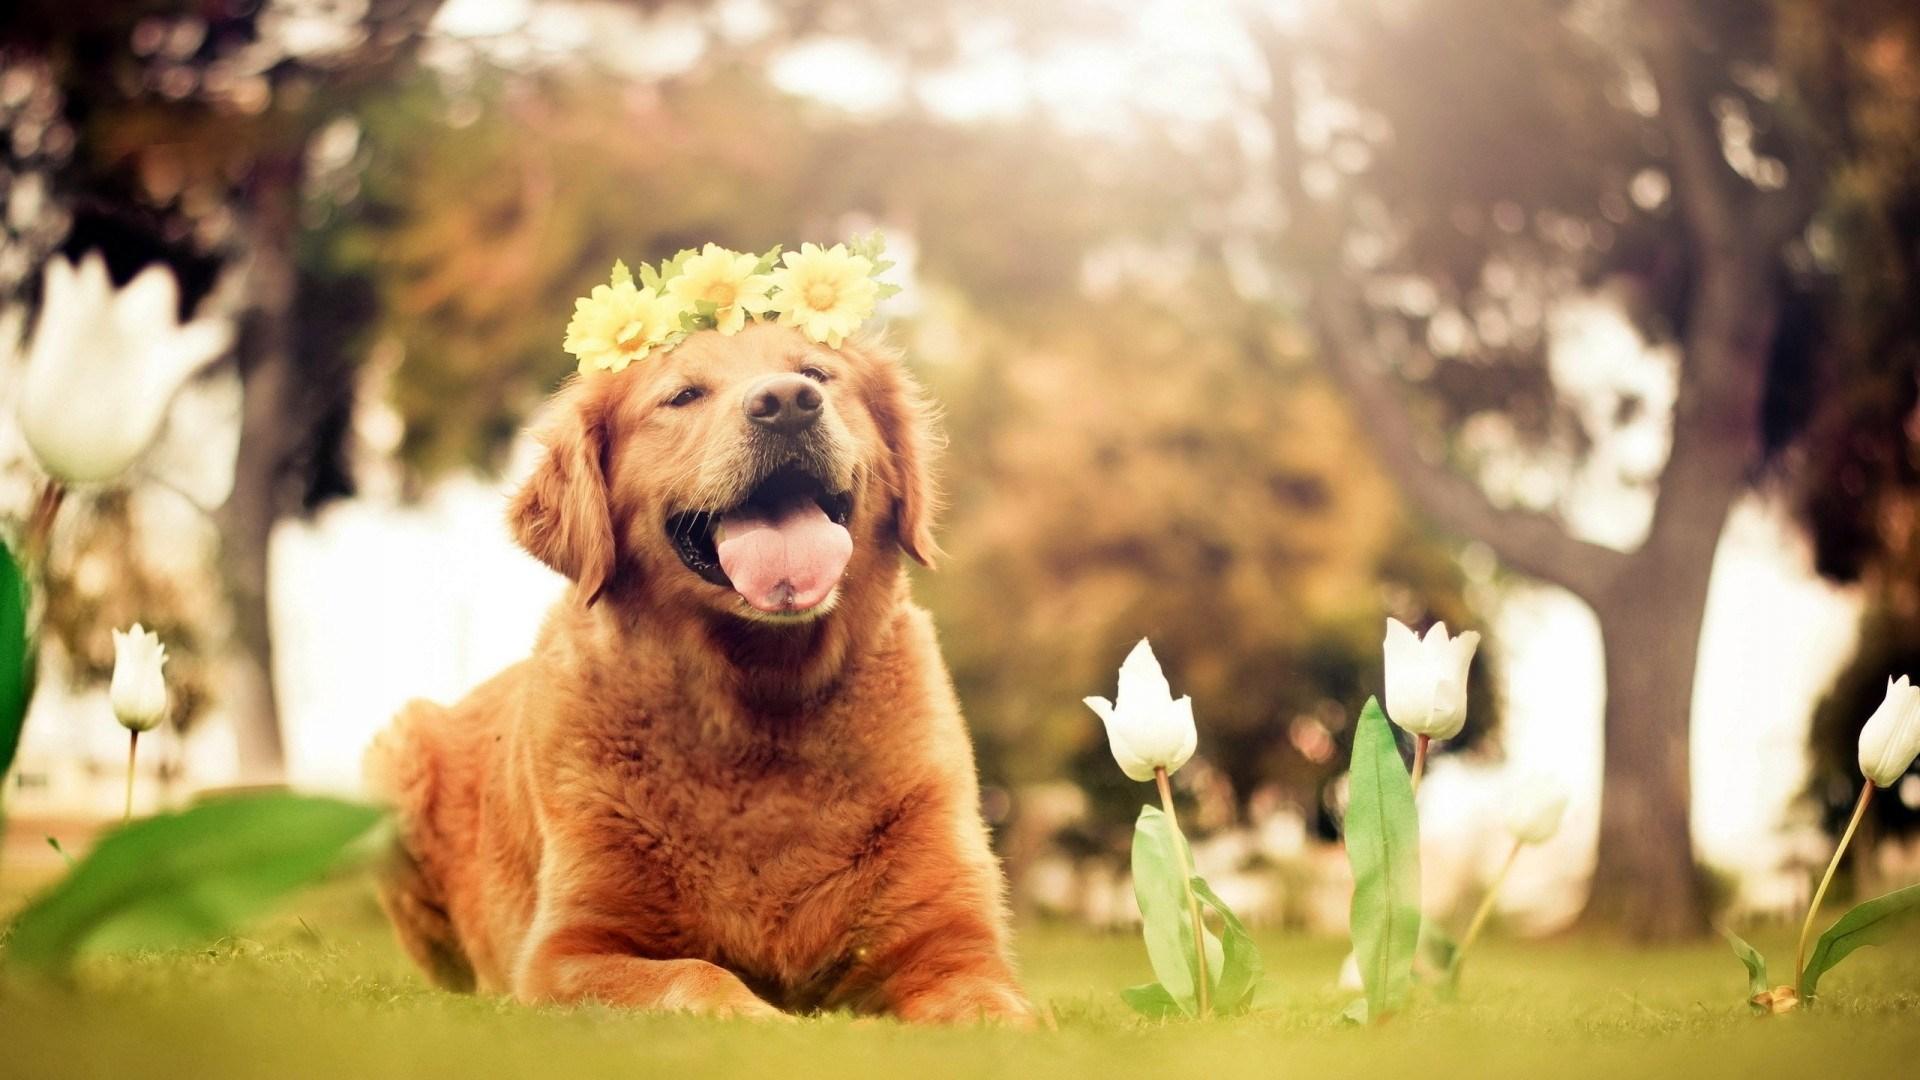 Hd wallpaper dog - Dogs Desktop Backgrounds Wallpaper High Definition High Quality